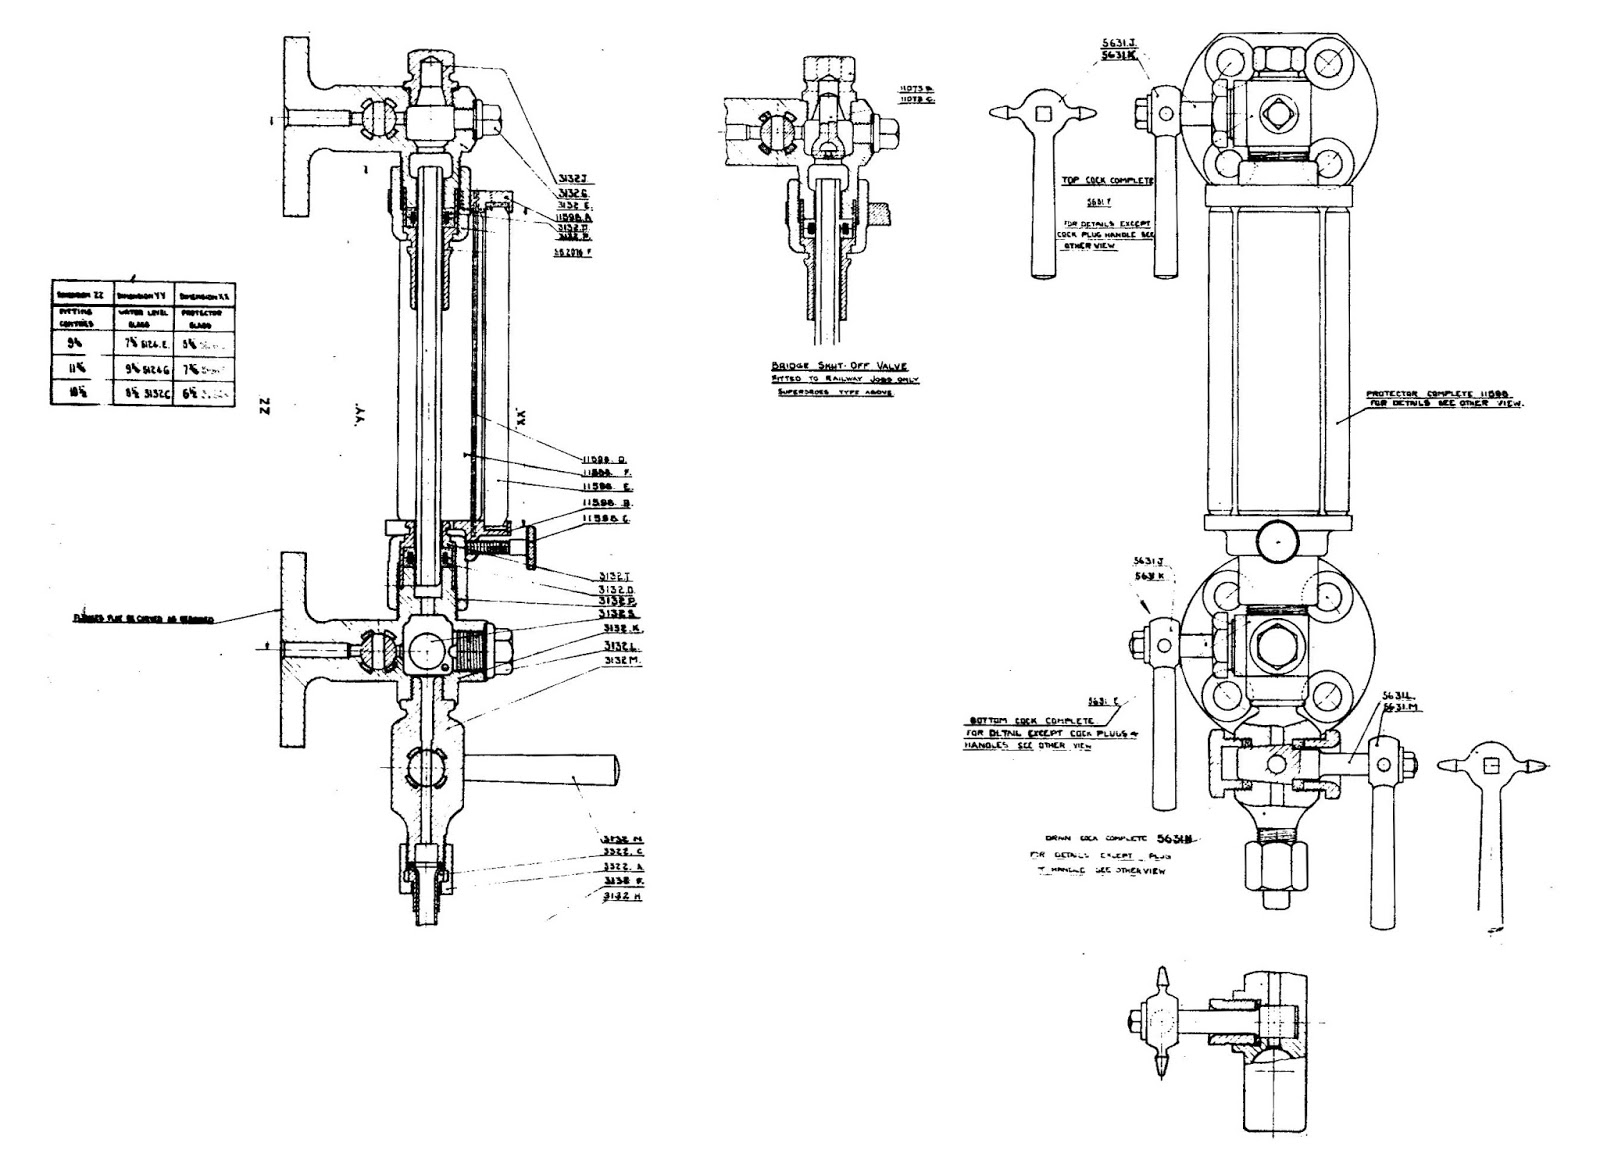 small resolution of gauge glass valve arrangement similar to 7109 s